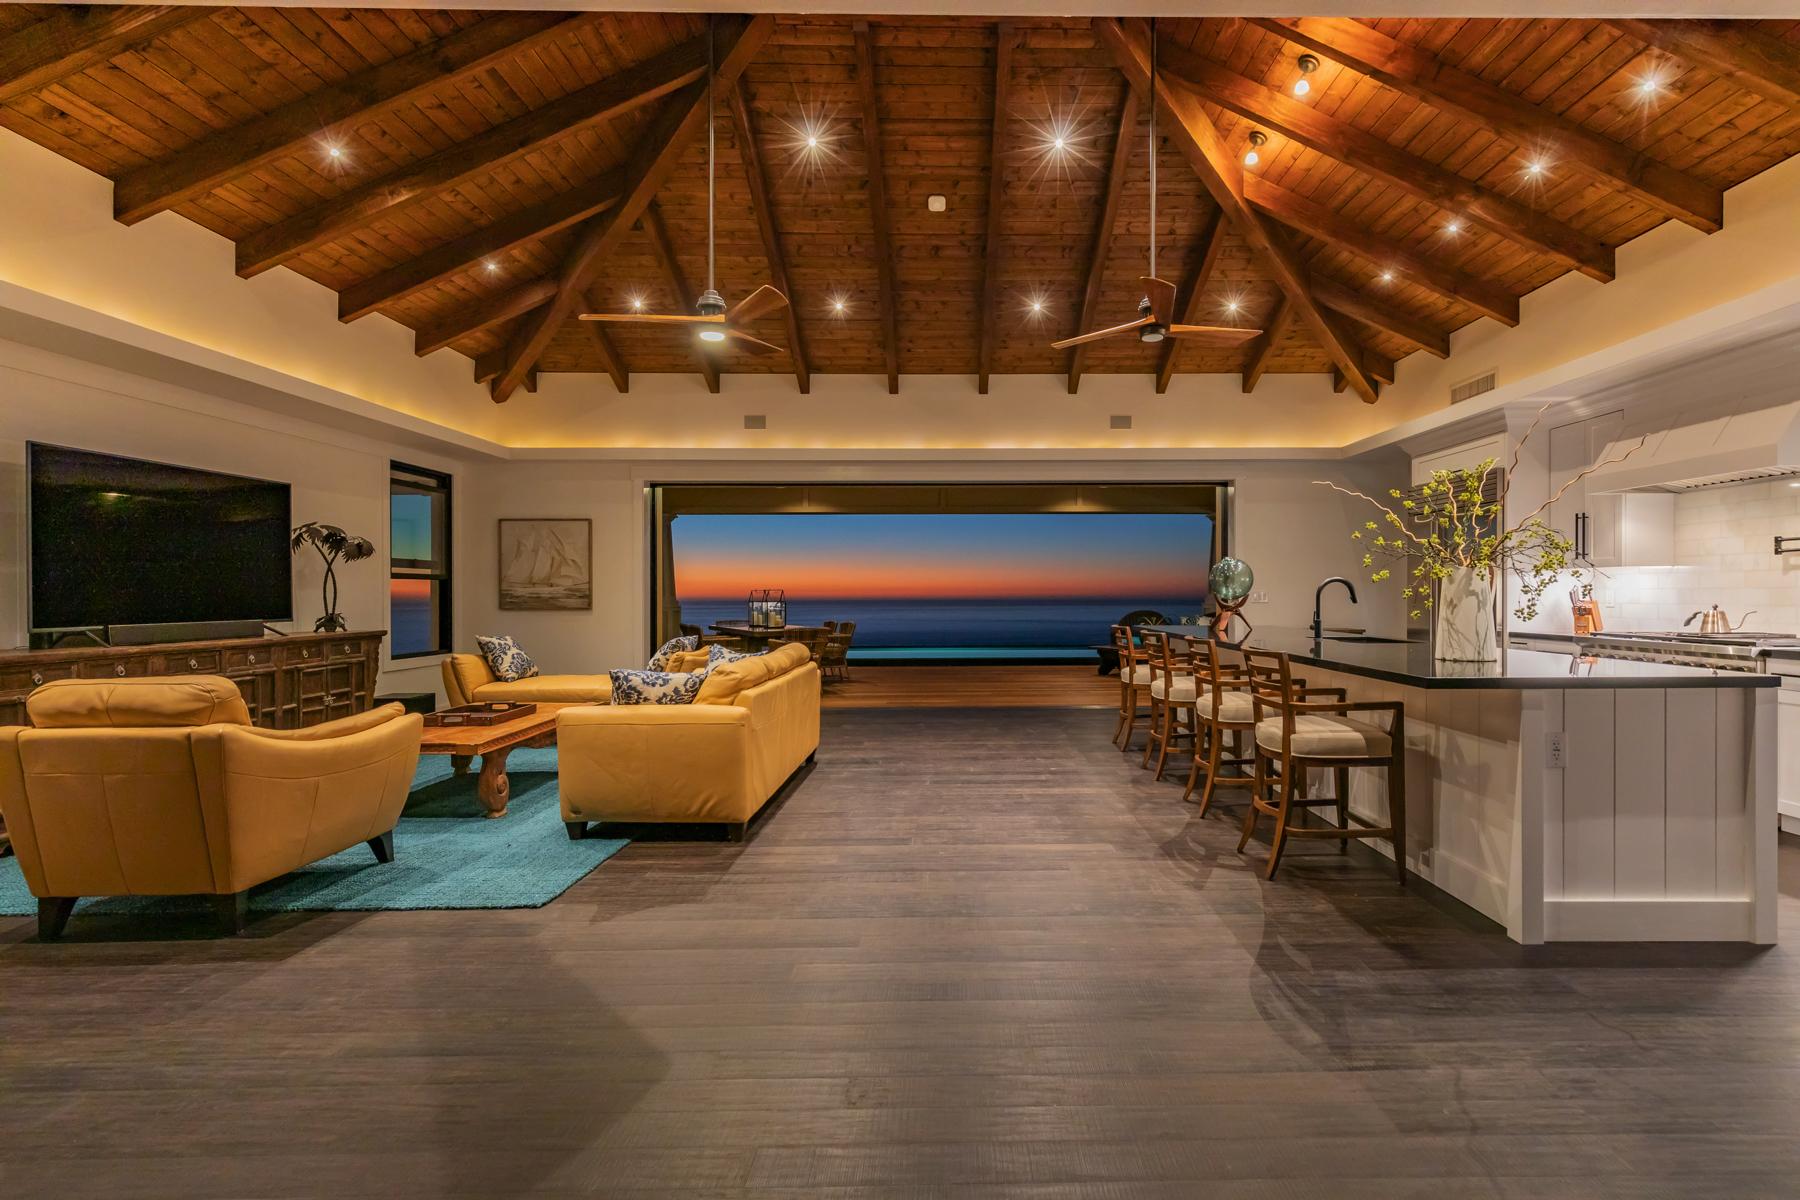 Single Family Homes για την Πώληση στο Outstanding Plantation Style Home 81-6678 Hualani Pl, Kealakekua, Χαβαη 96750 Ηνωμένες Πολιτείες